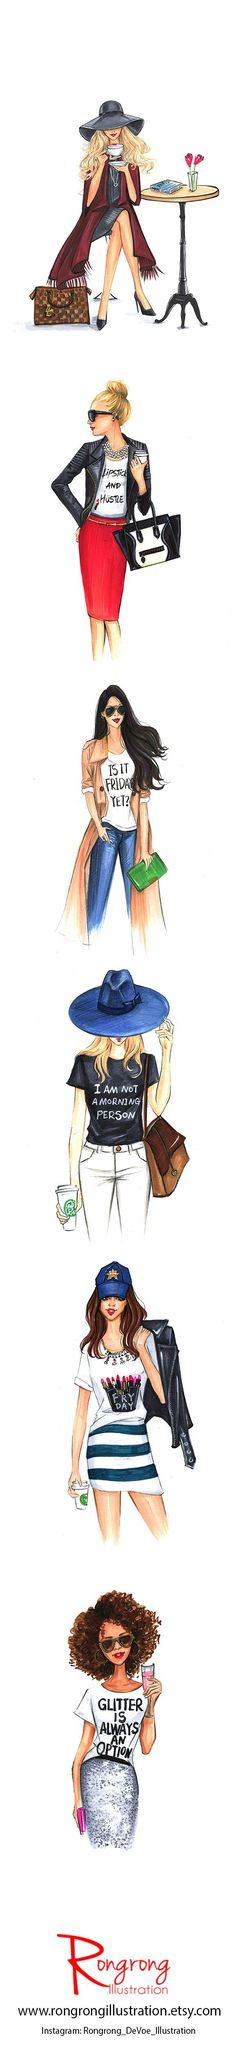 nice RongrongIllustration by http://www.polyvorebydana.us/fashion-sketches/rongrongillustration/